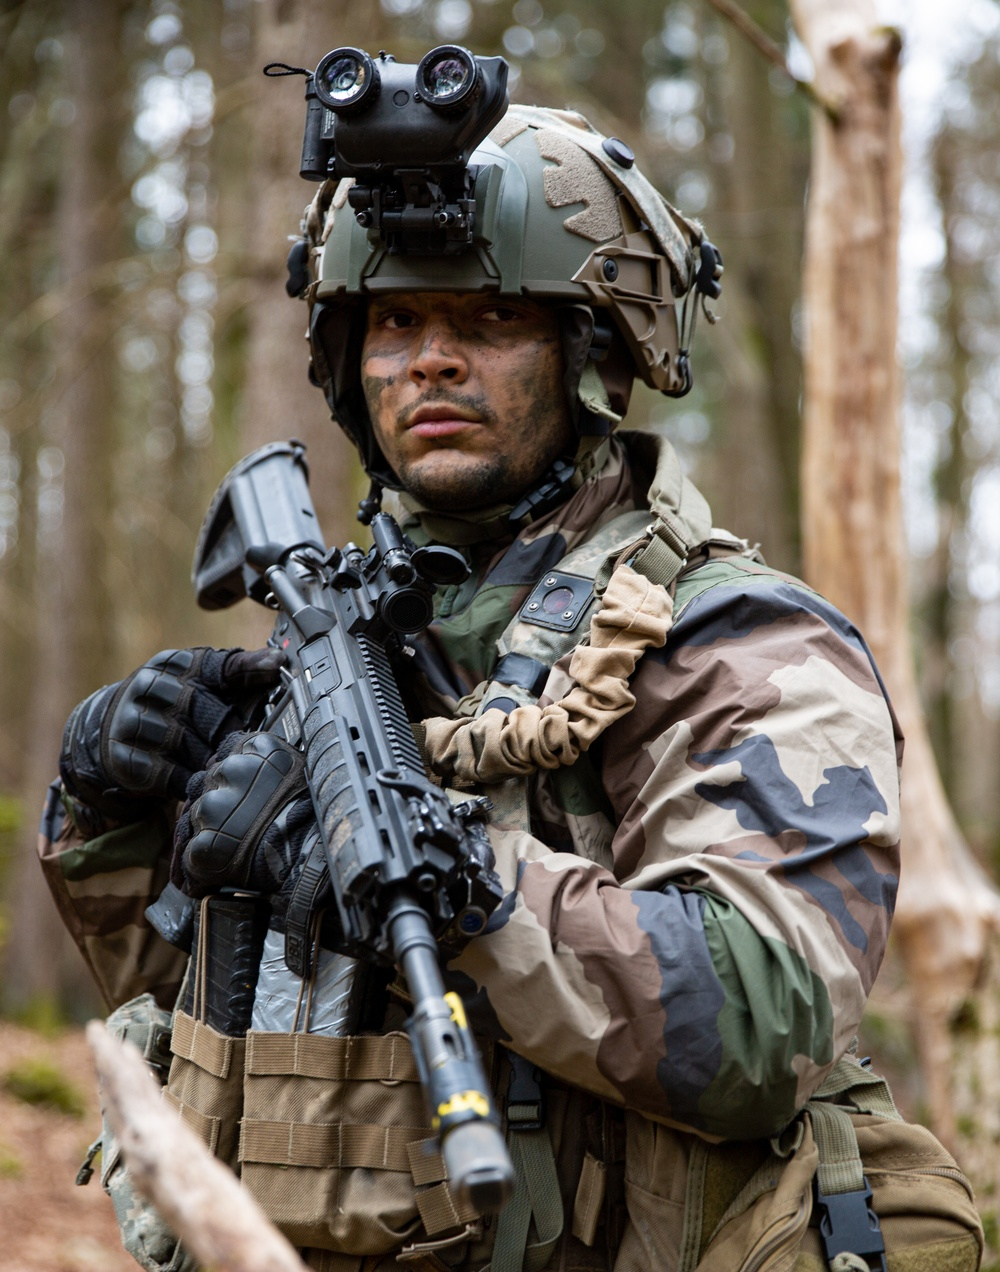 Training to win at Dragoon Ready 21